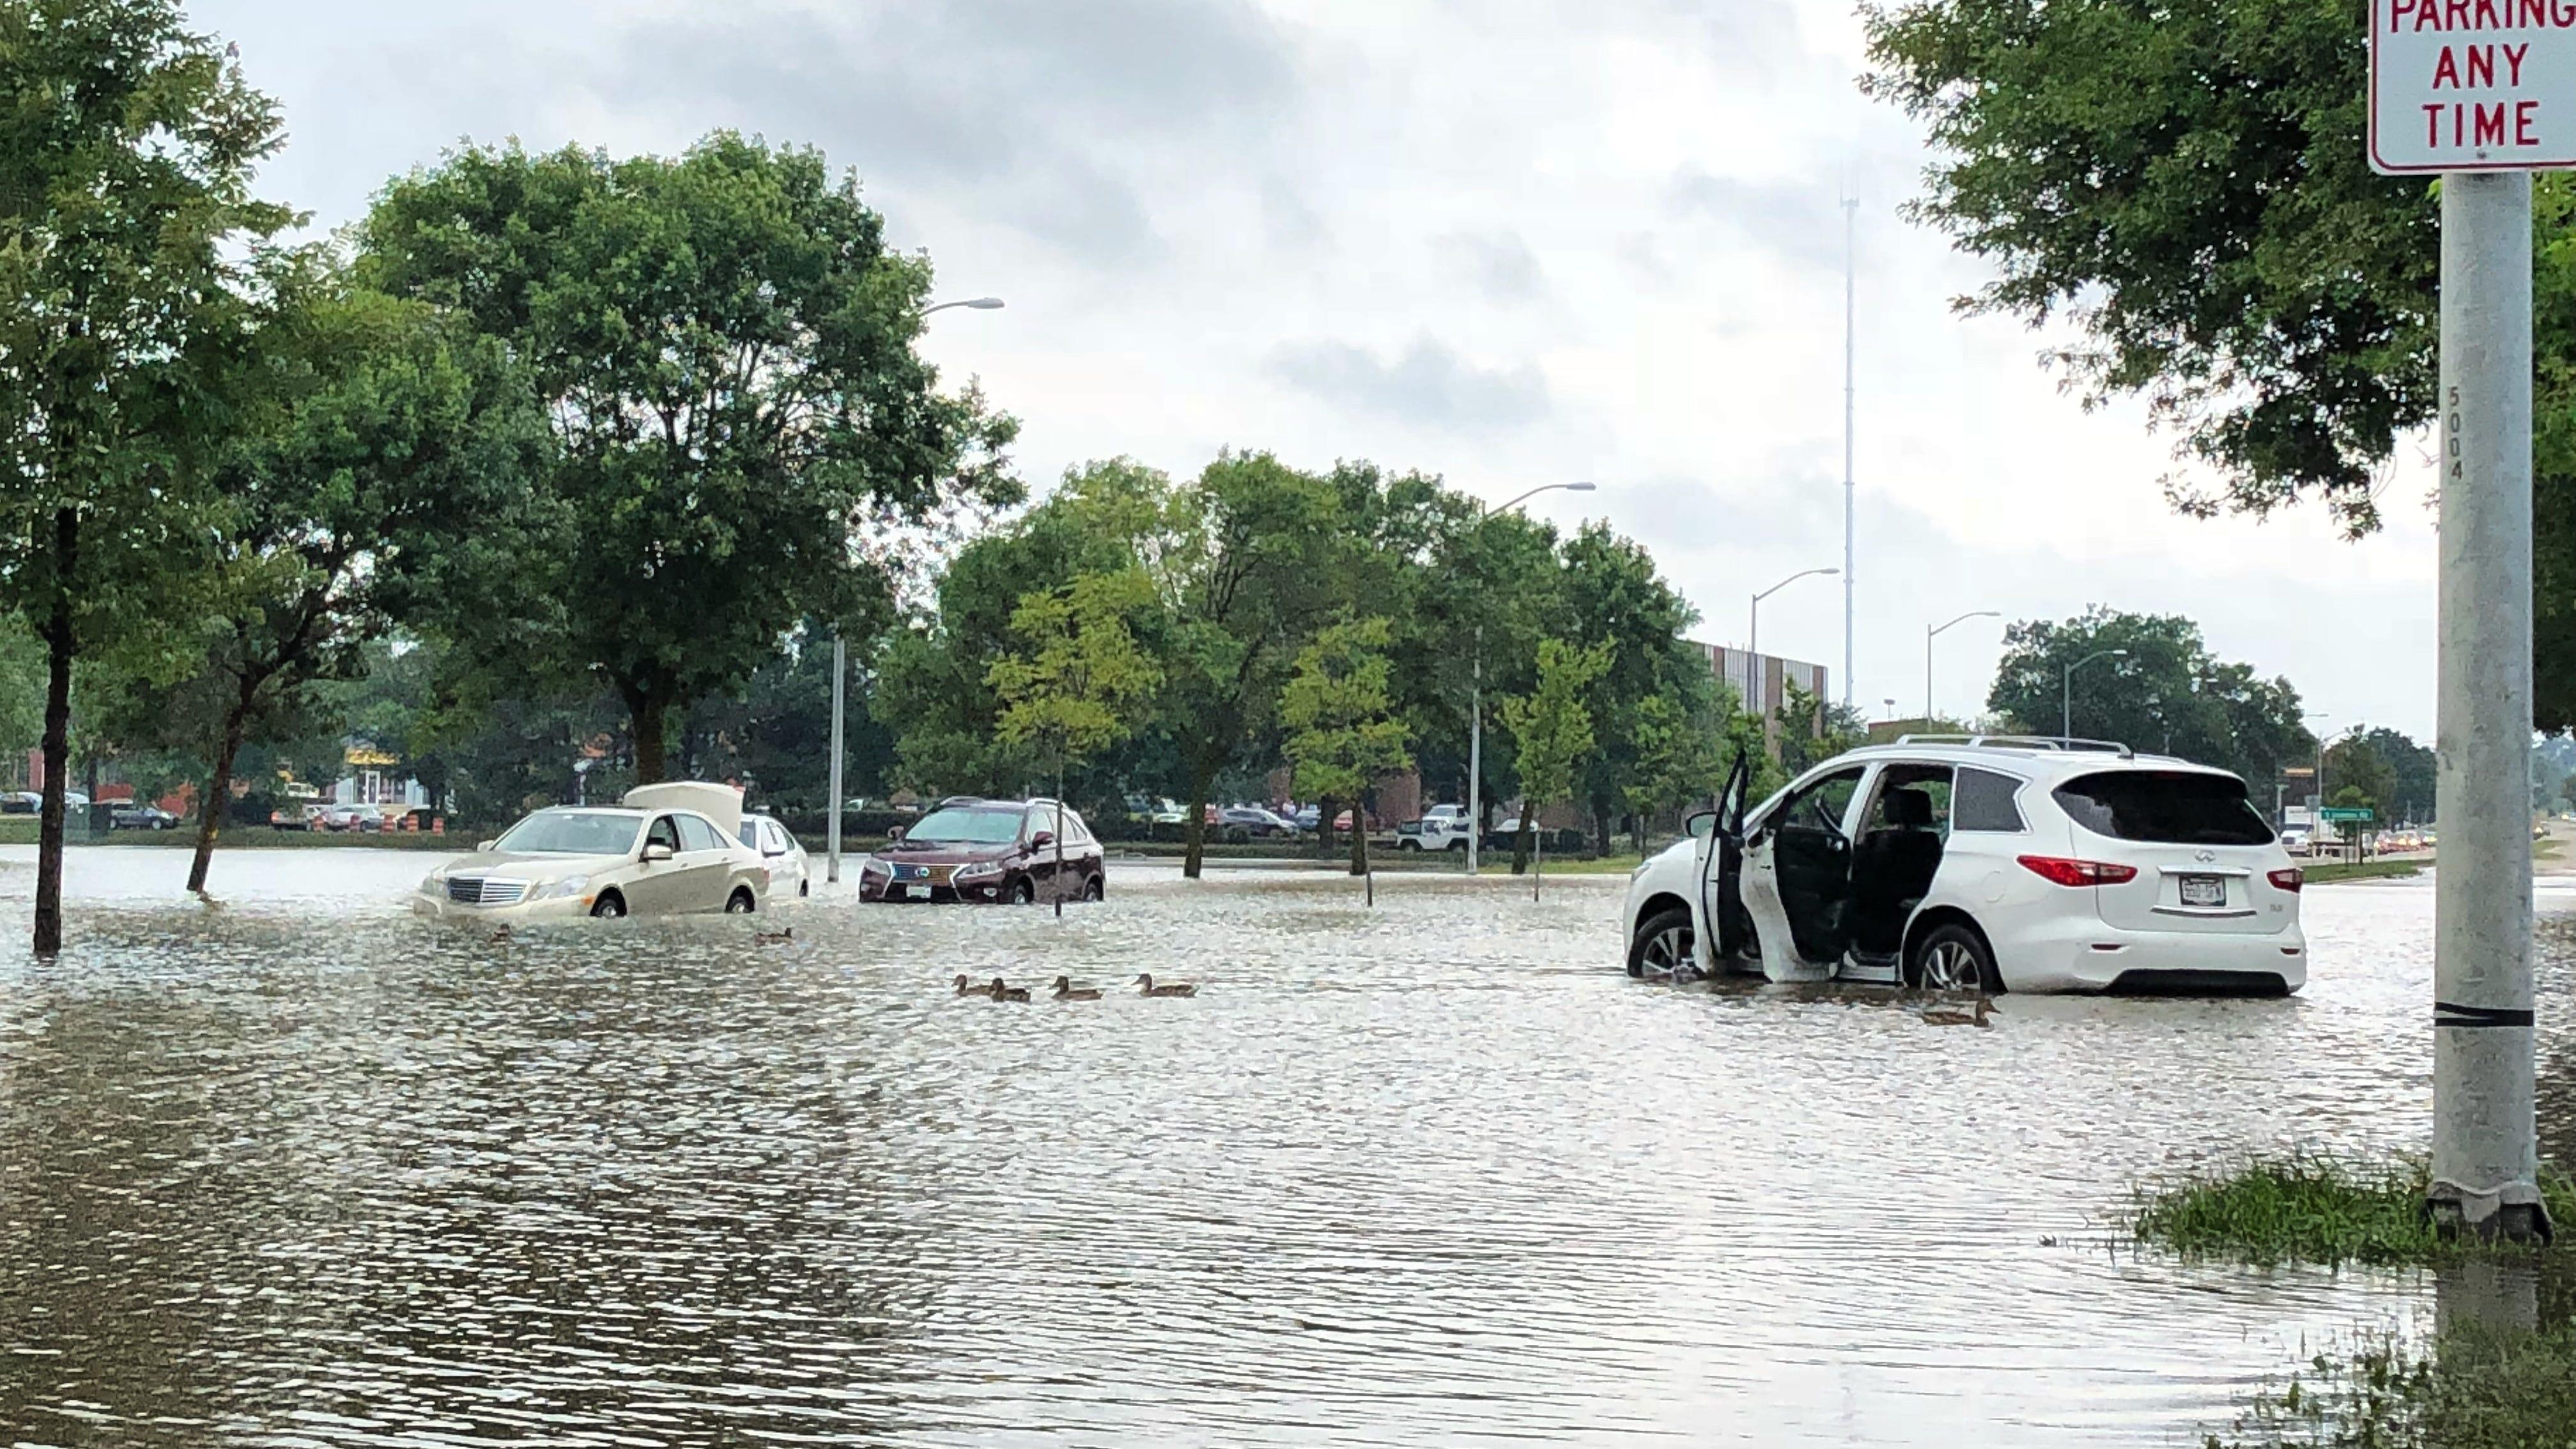 Near Record Rain Swamps Dane County Madison Killing A Motorist Widespread Flooding Reported